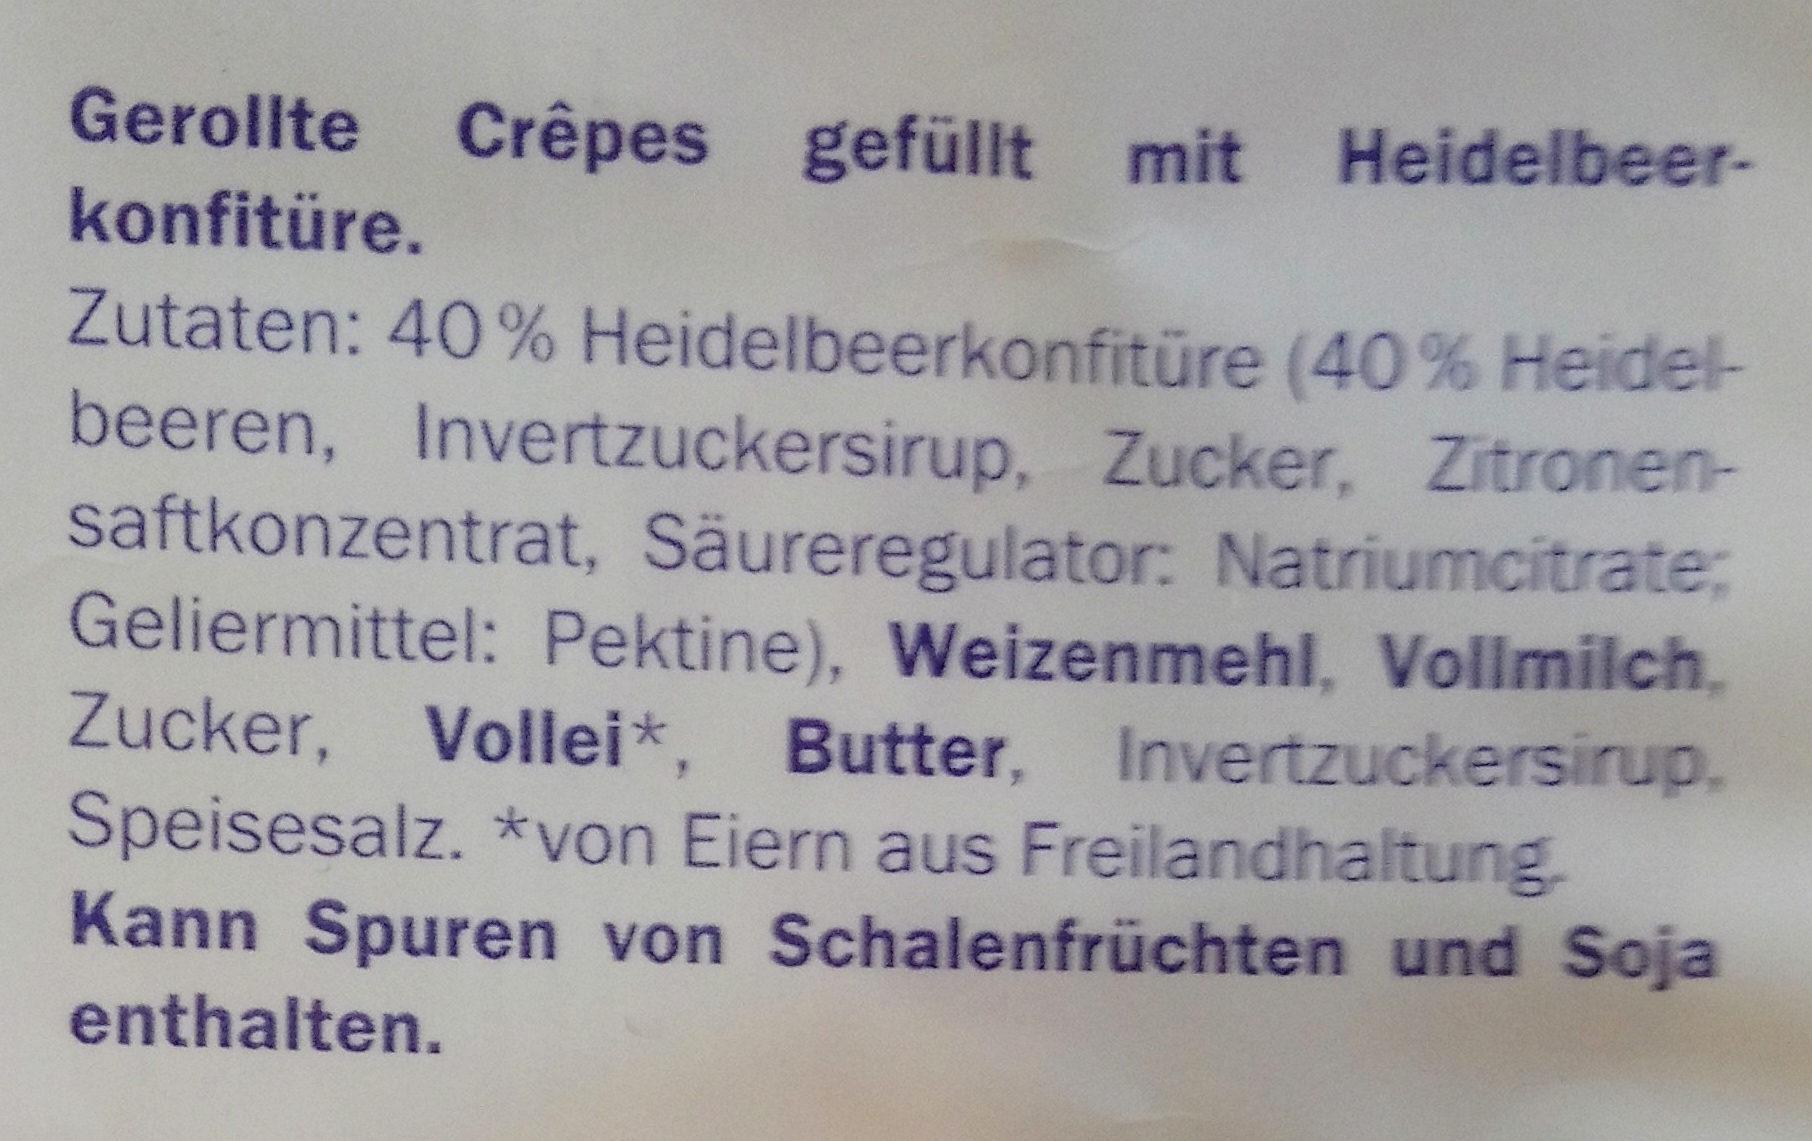 Crêpes gefüllt mit Heidelbeerkonfitüre - Ingredients - de